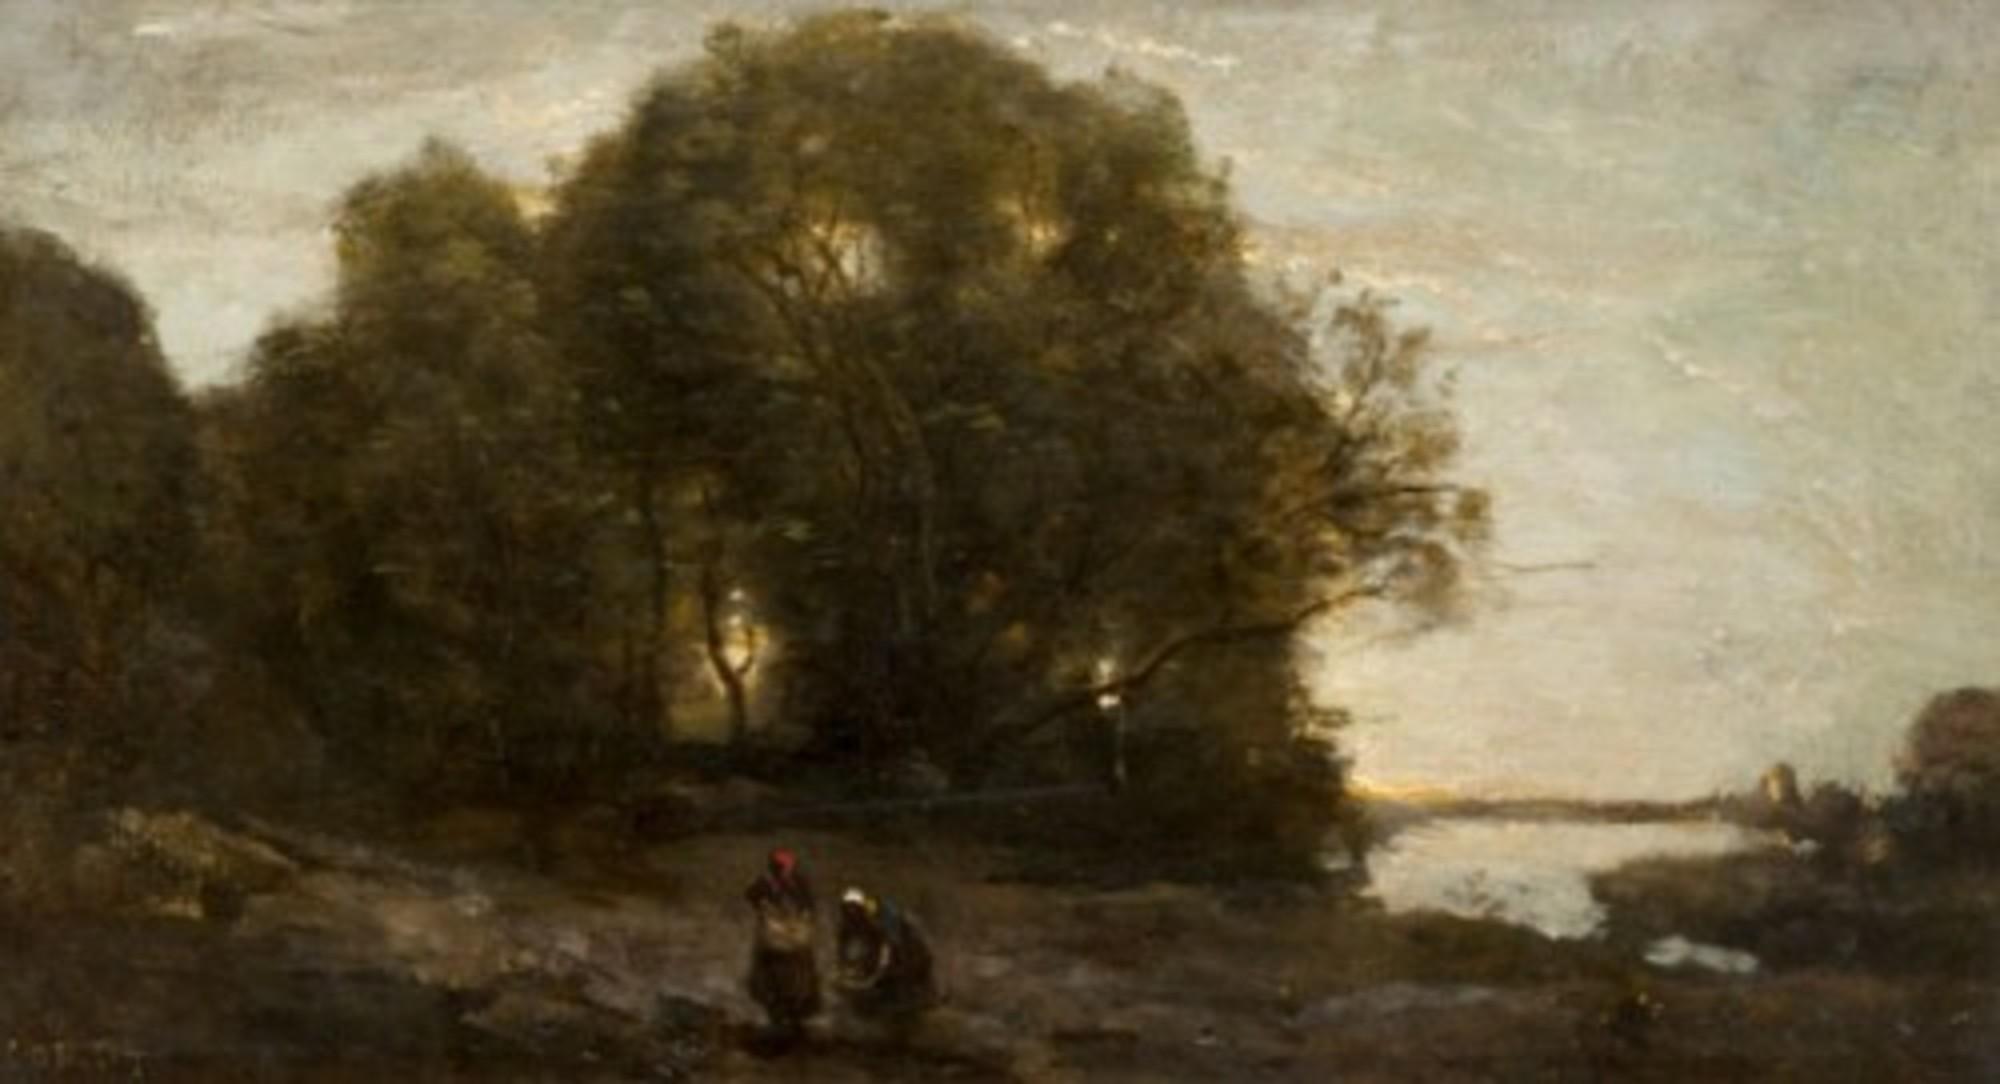 Corot---Evening-circa-1865-1875-possibly.jpg